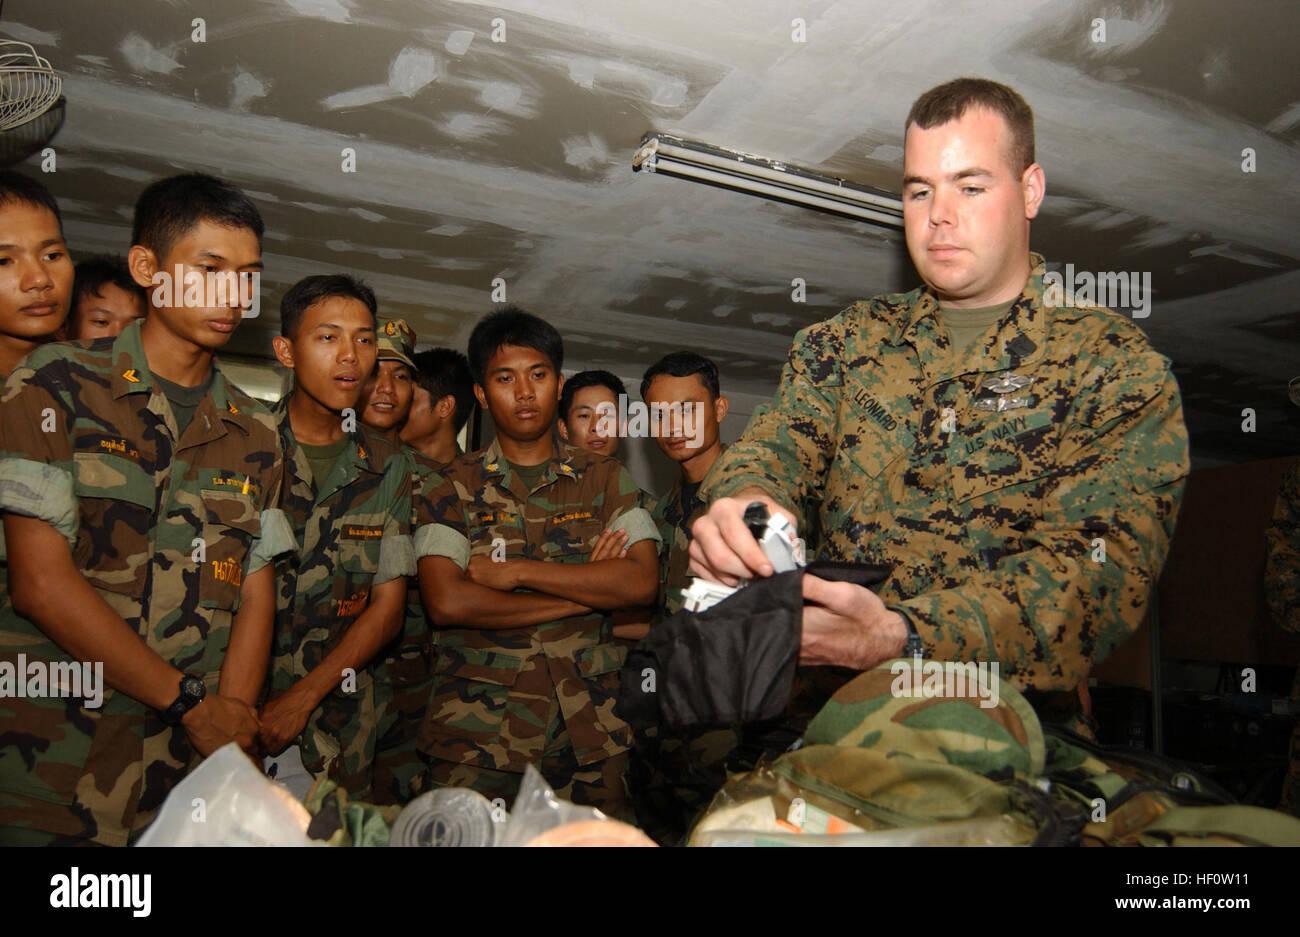 050502-0596N-220 Sattahip, Thailand (May 2, 2005) - Petty Officer 1st Class Matthew J. Leonard shows an emergency - Stock Image